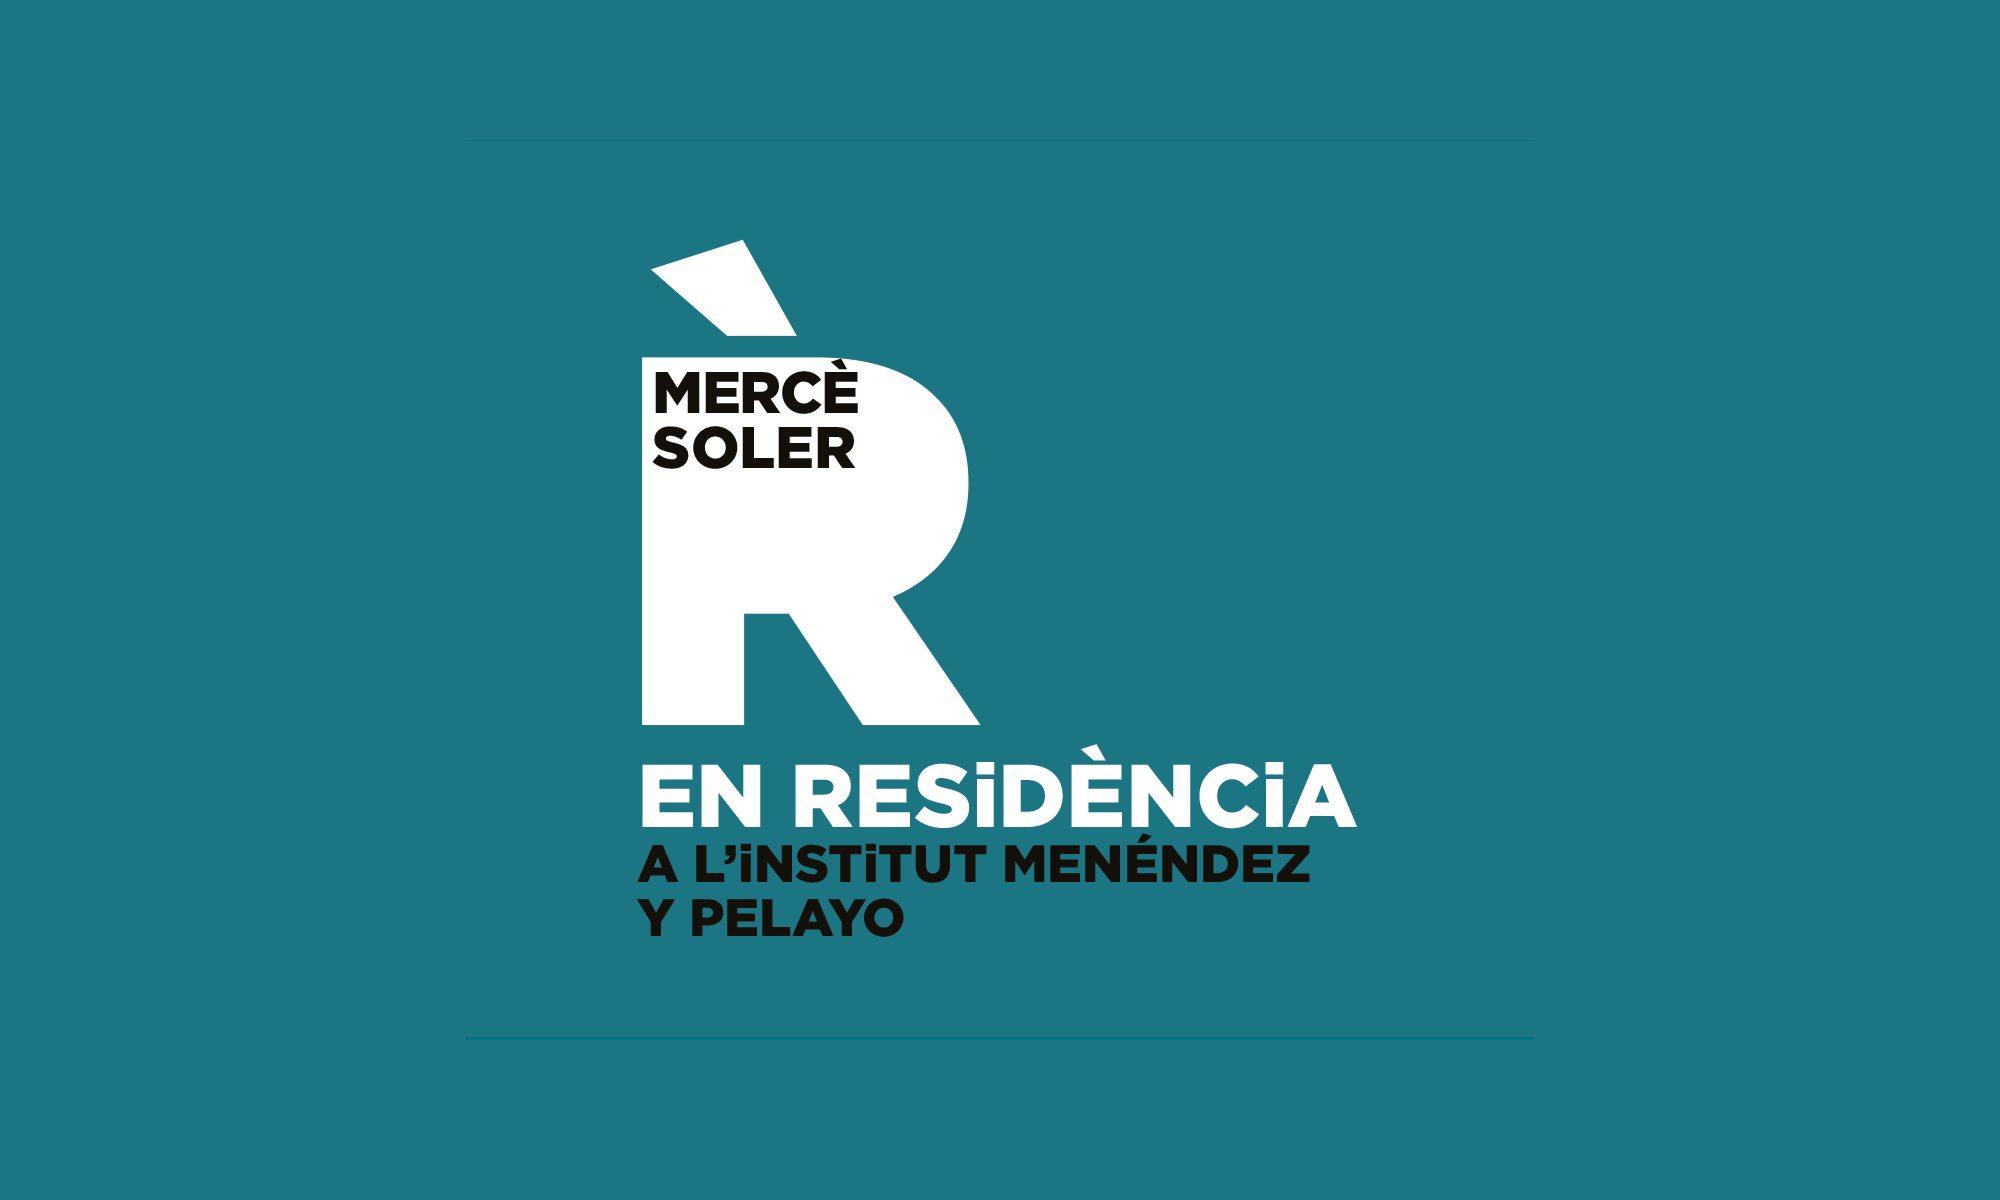 Mercè Soler EN RESiDÈNCiA